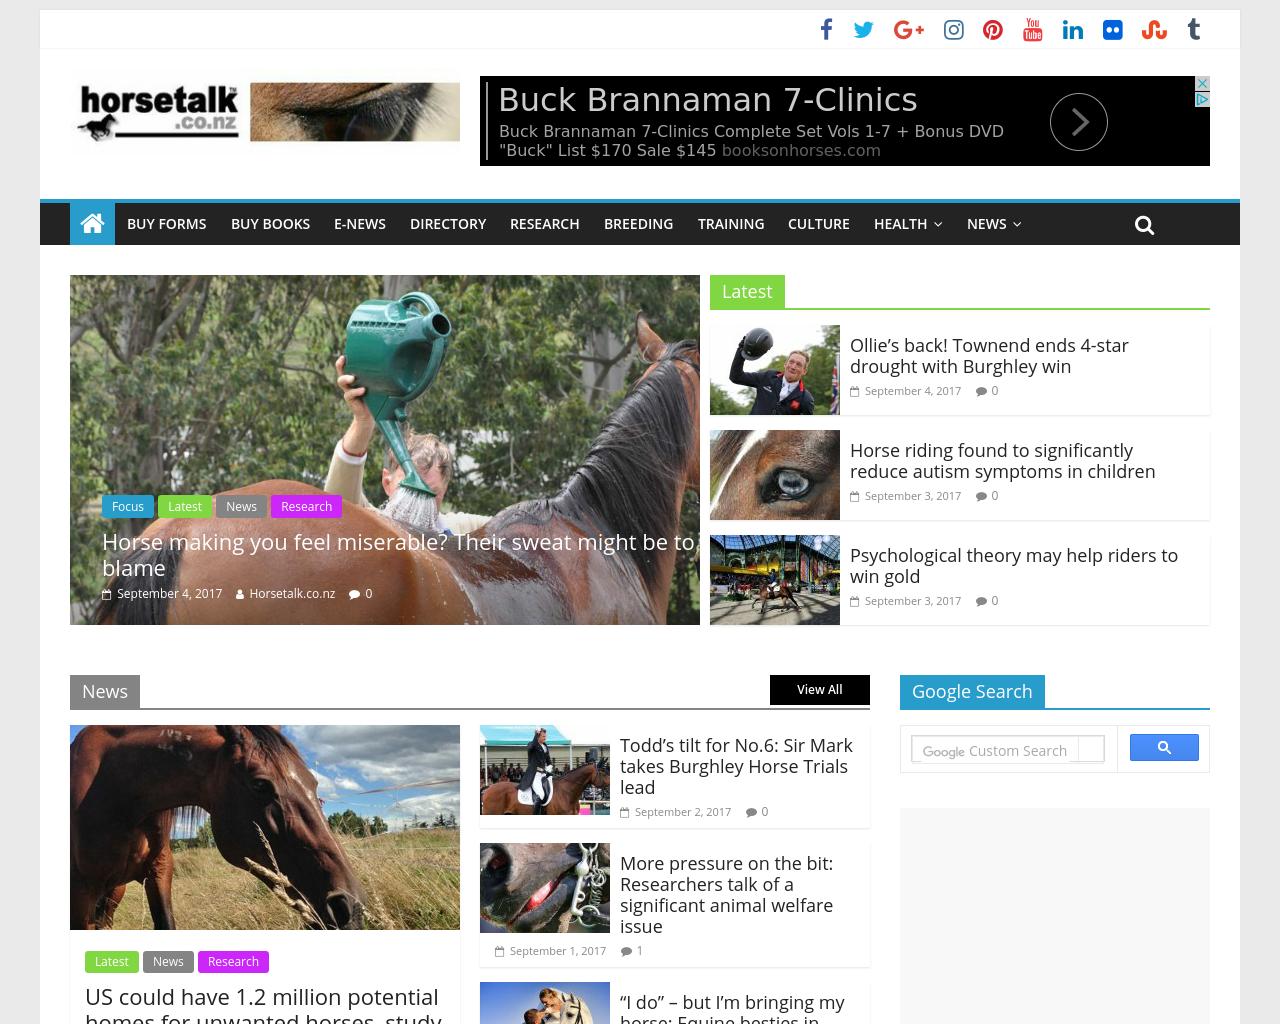 Horsetalk-Advertising-Reviews-Pricing